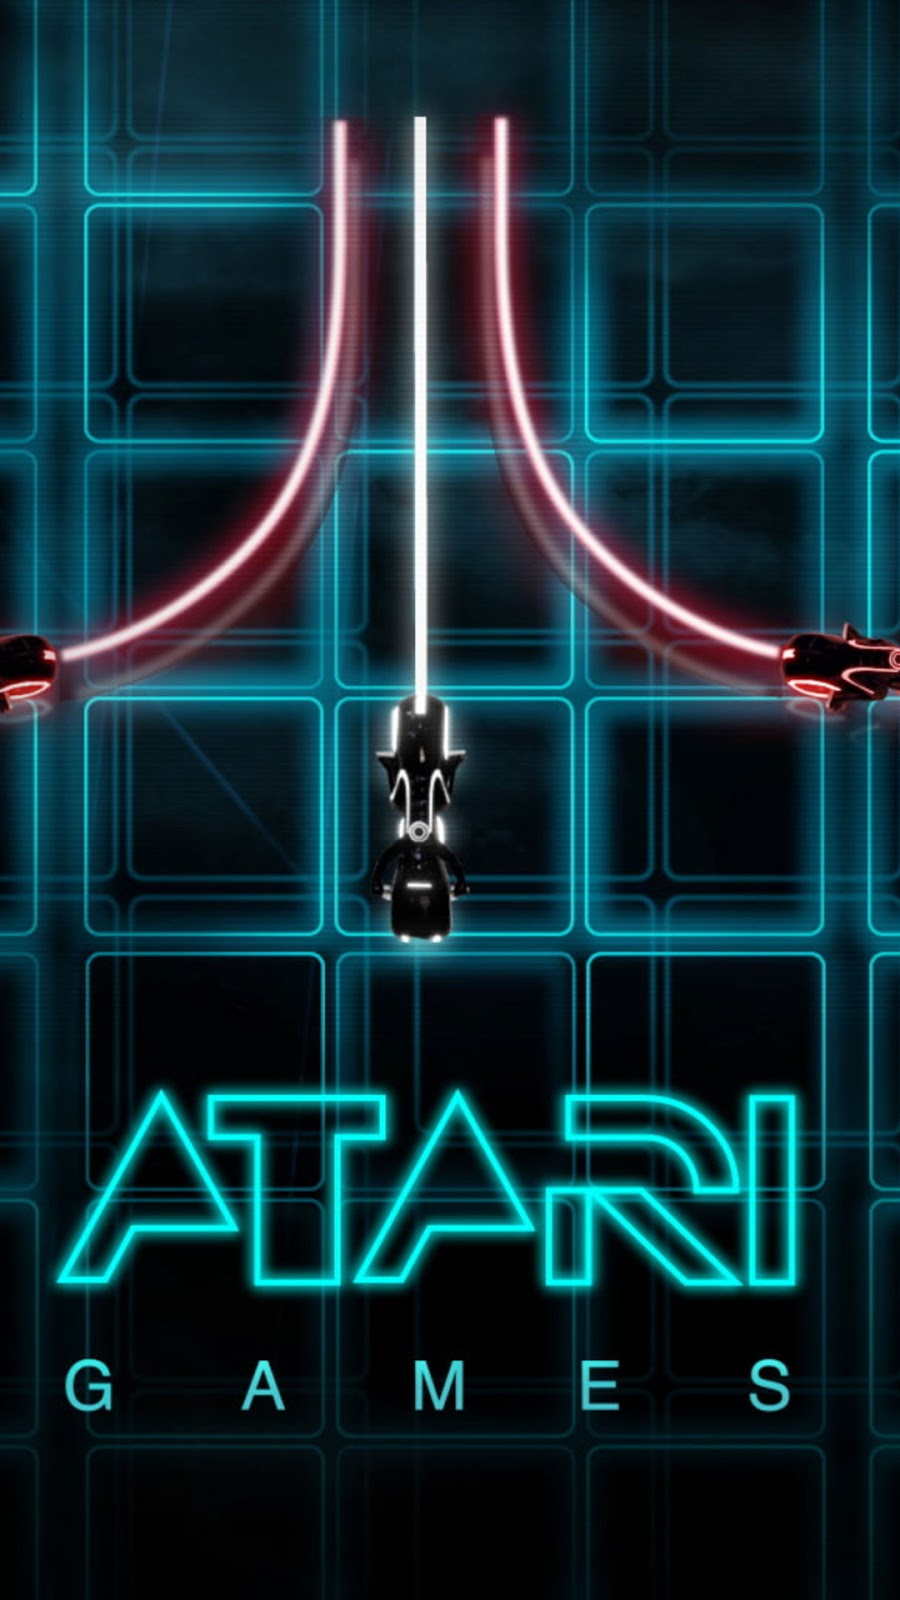 Papel de Parede Vintage Atari Video Game